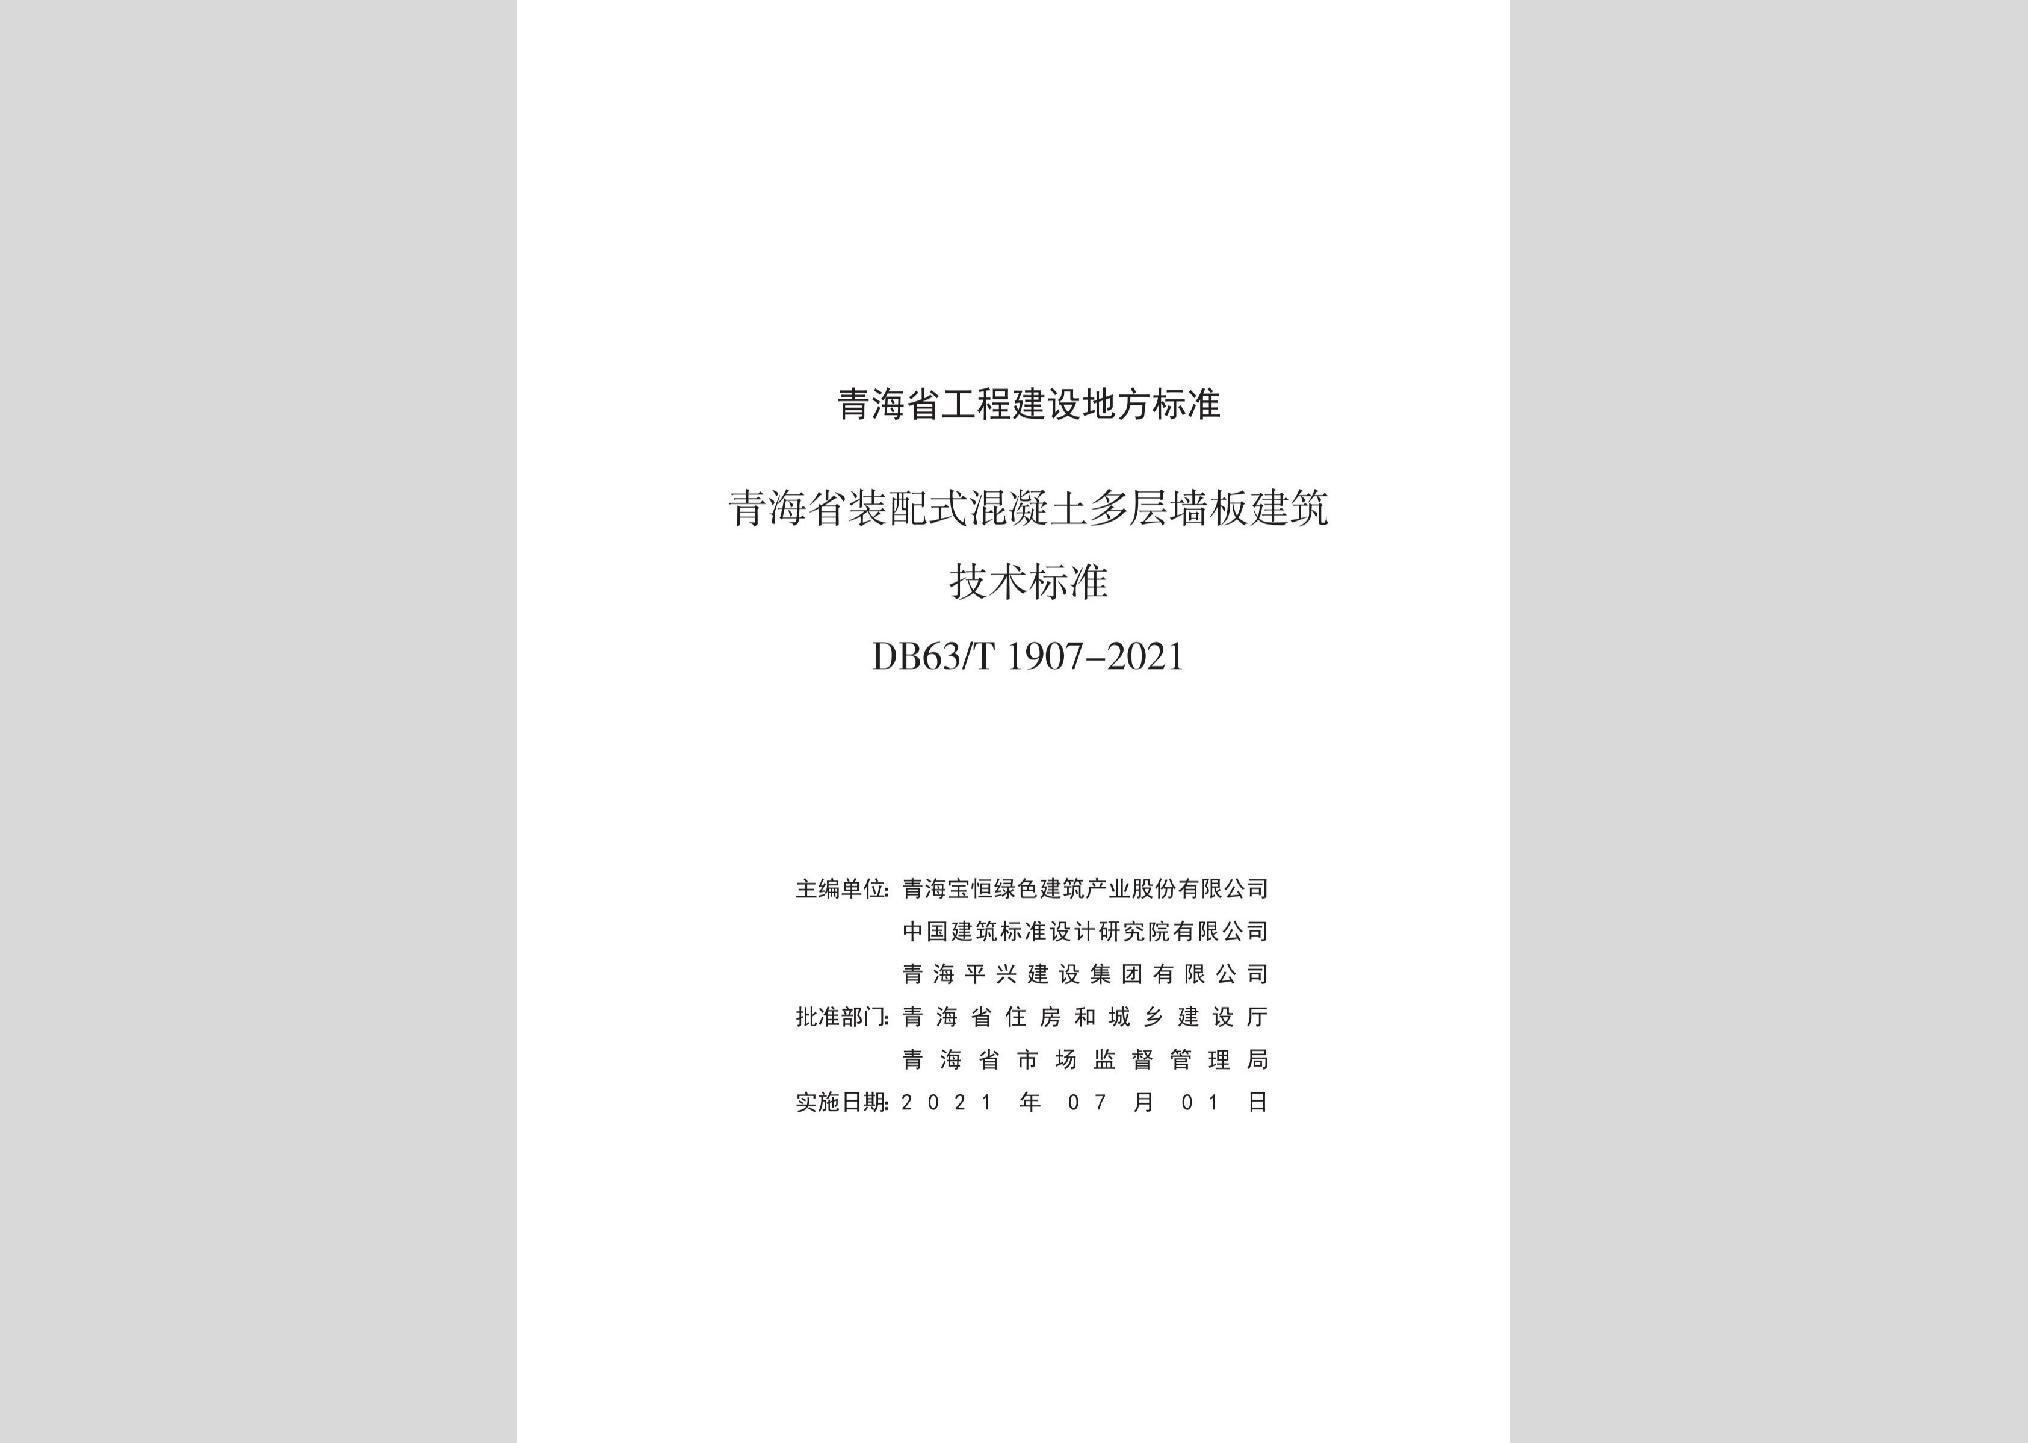 DB63/T1907-2021:青海省装配式混凝土多层墙板建筑技术标准